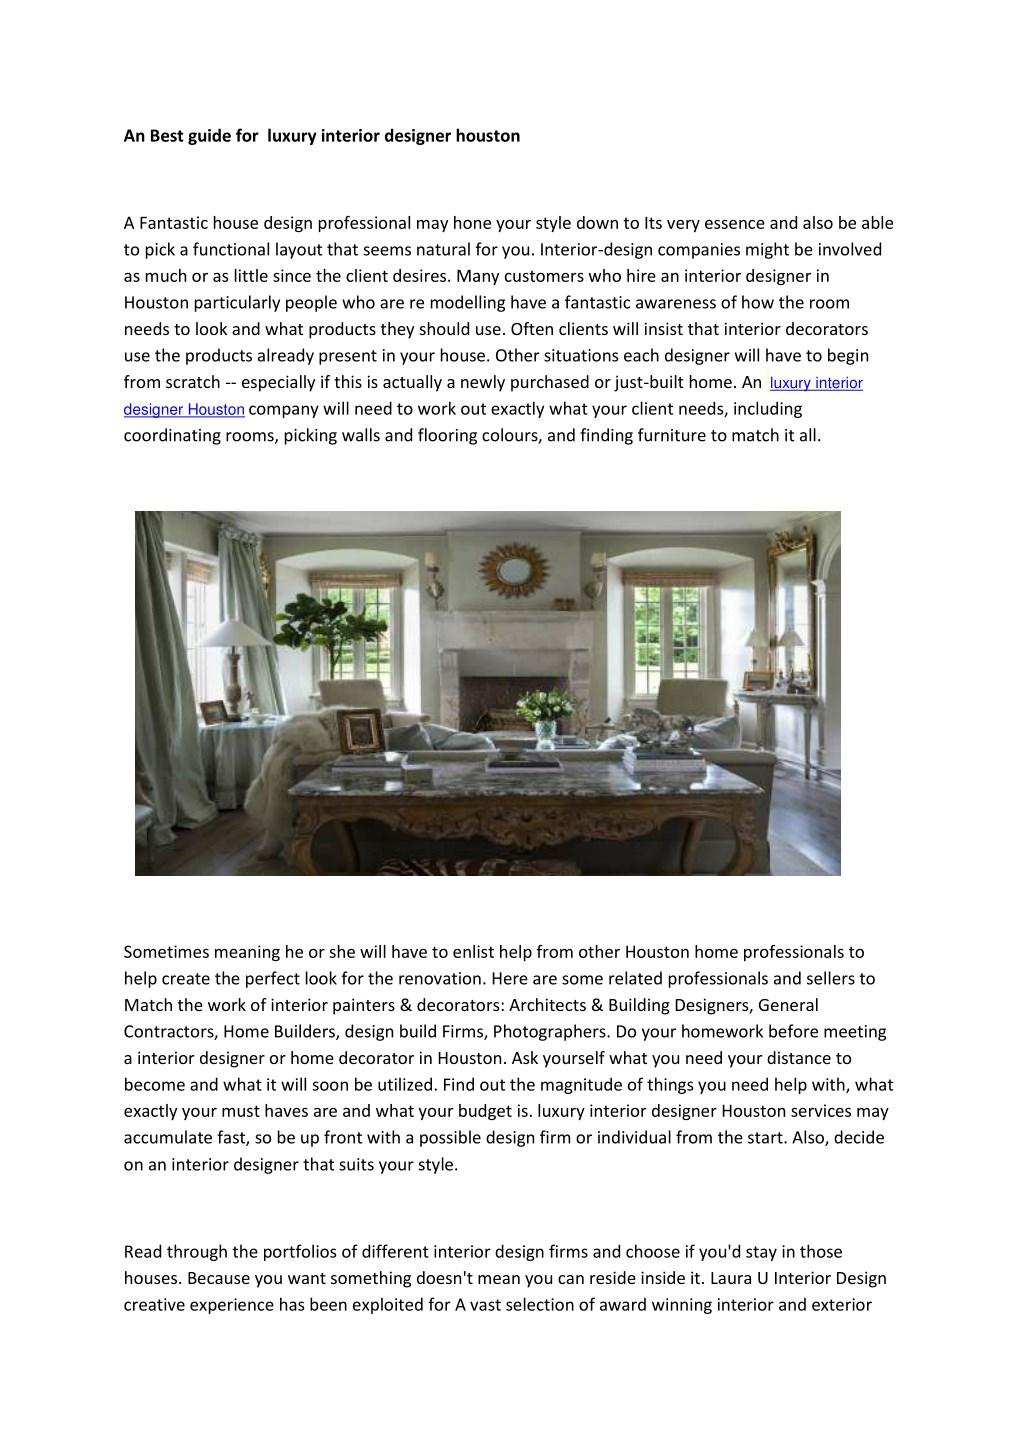 Ppt Luxury Interior Designer Houston Powerpoint Presentation Free Download Id 7736852,Braid Designs For Males